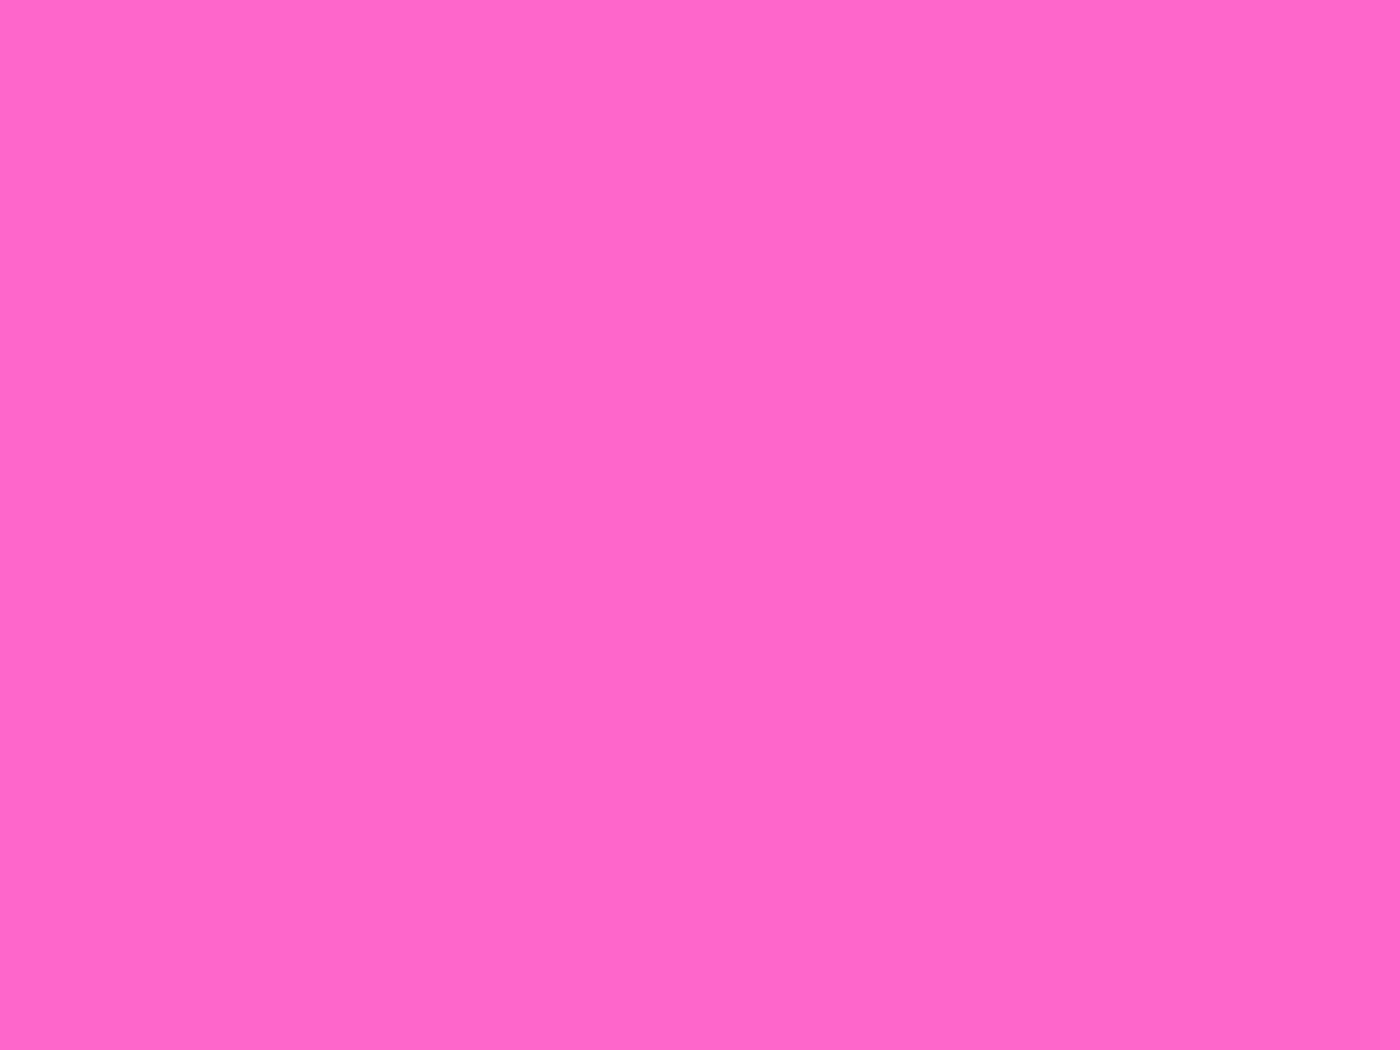 1400x1050 Rose Pink Solid Color Background